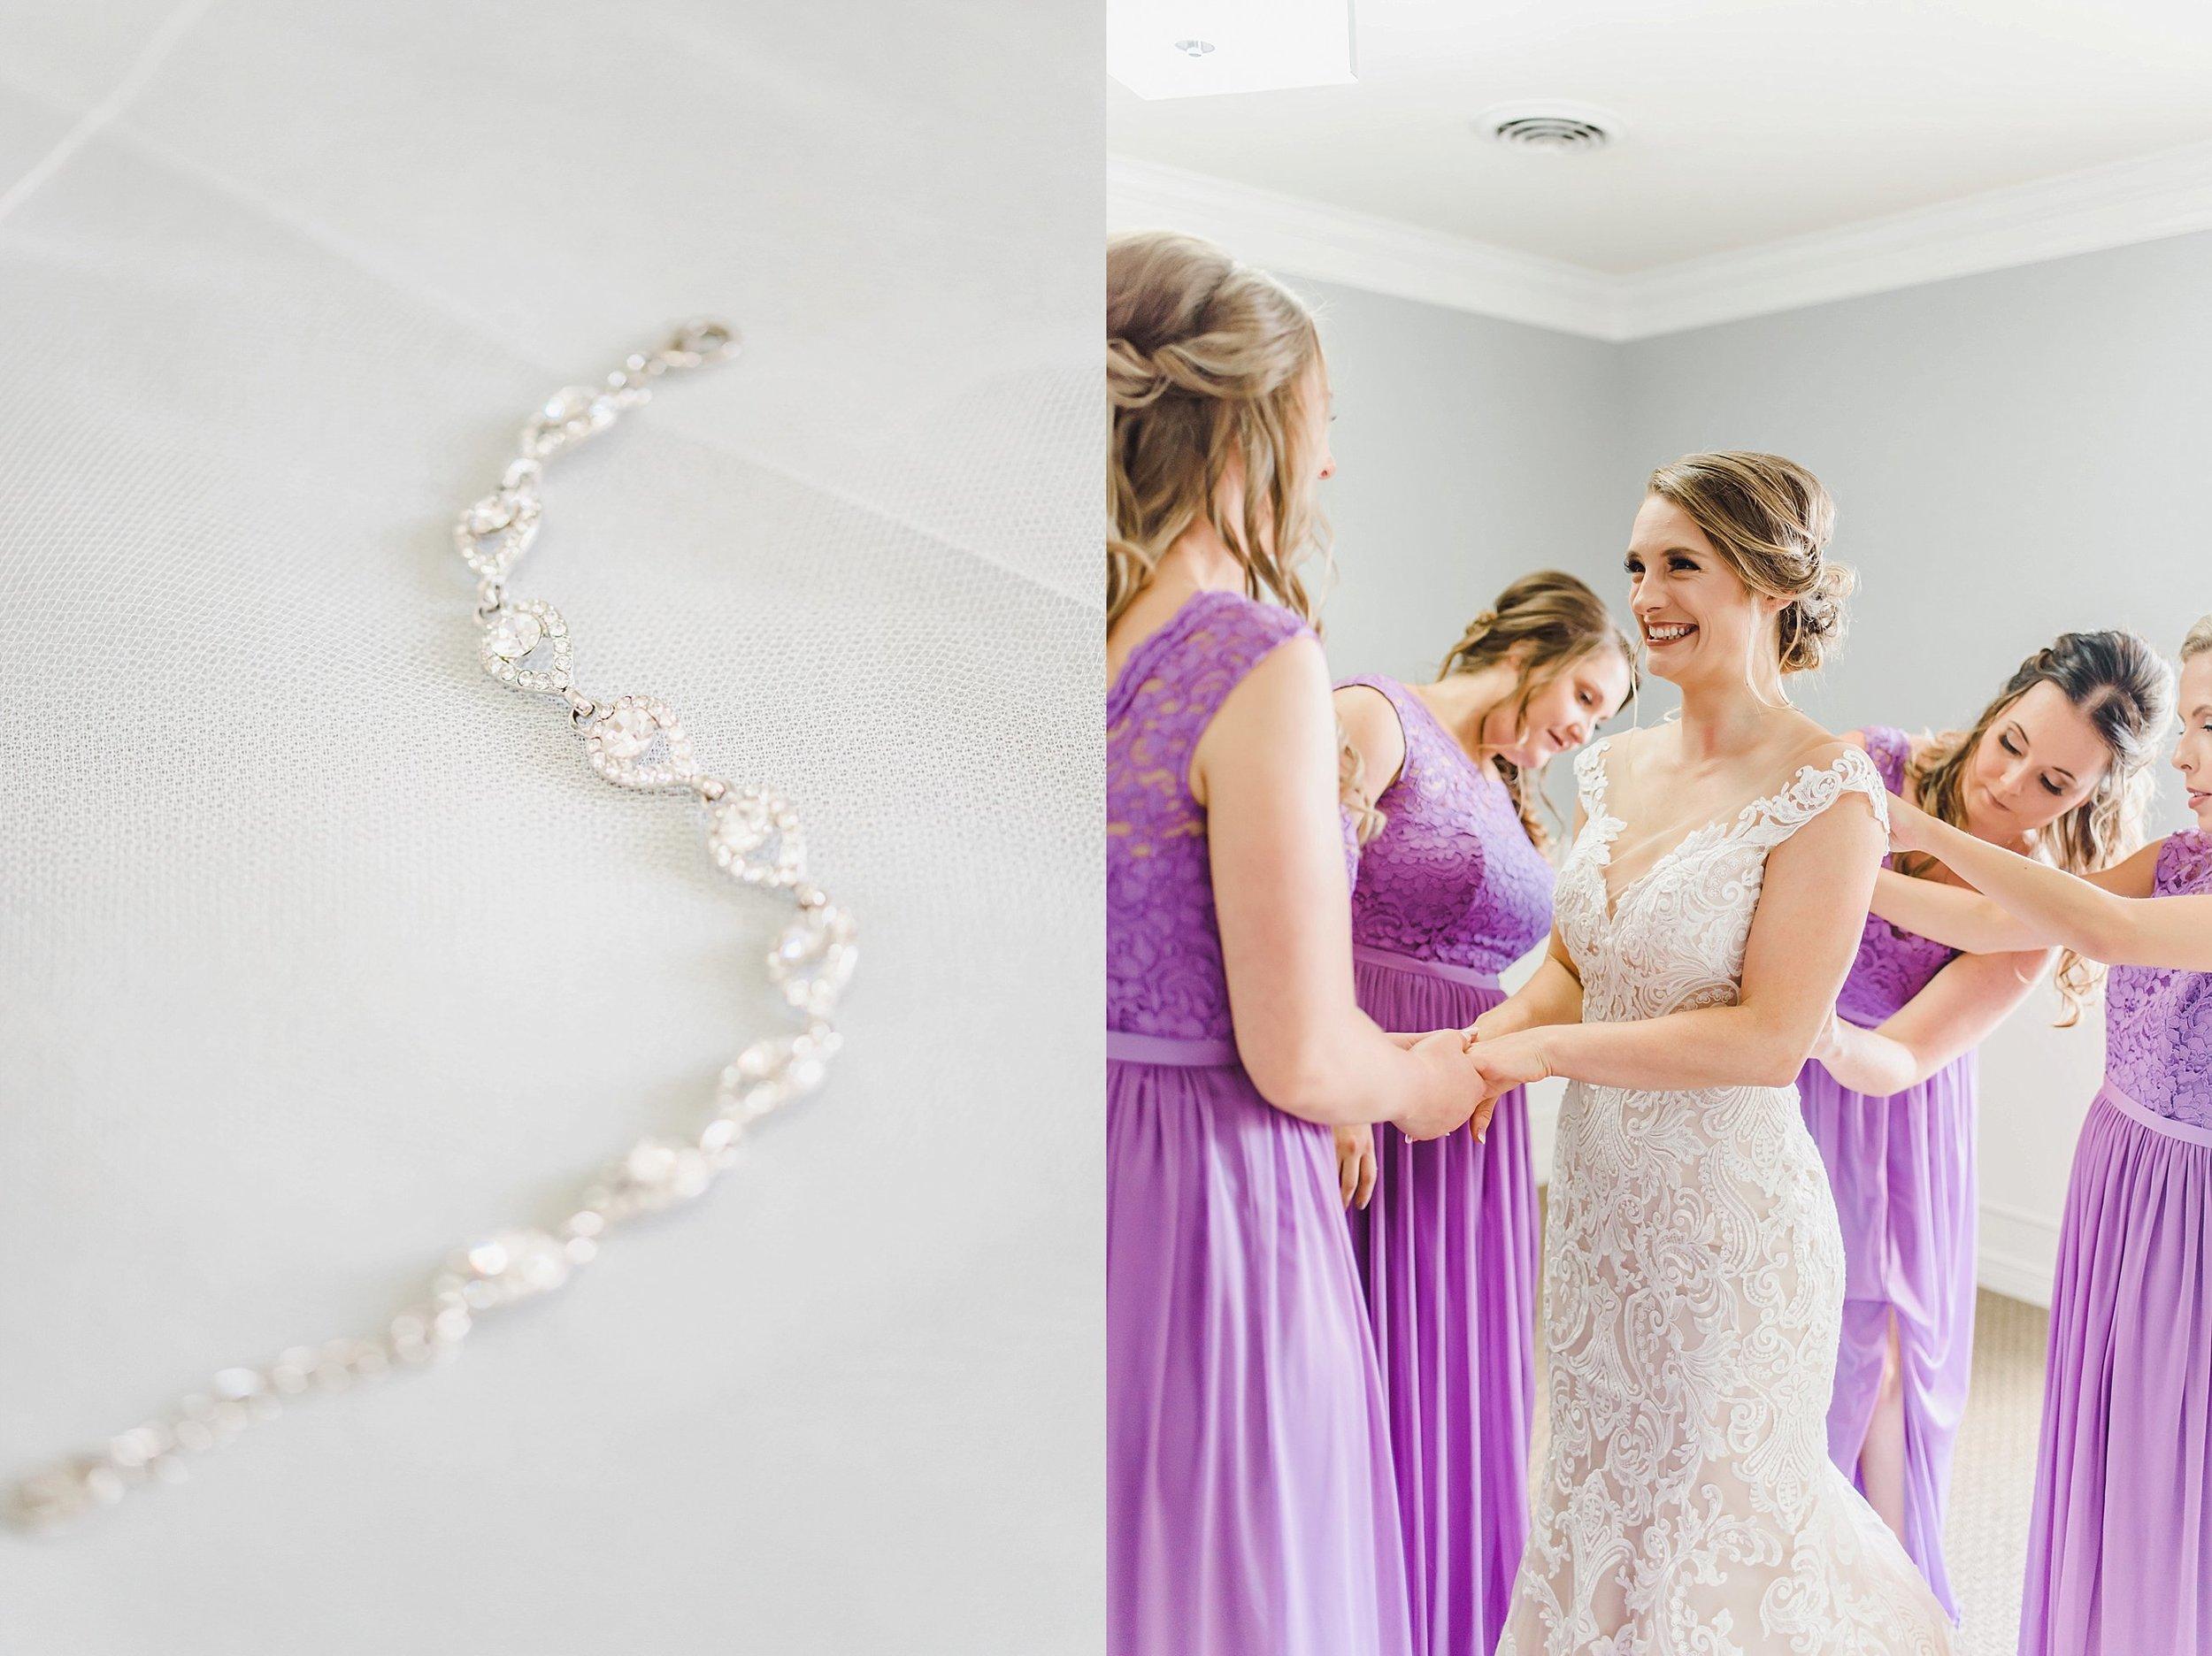 light airy indie fine art ottawa wedding photographer | Ali and Batoul Photography_1223.jpg